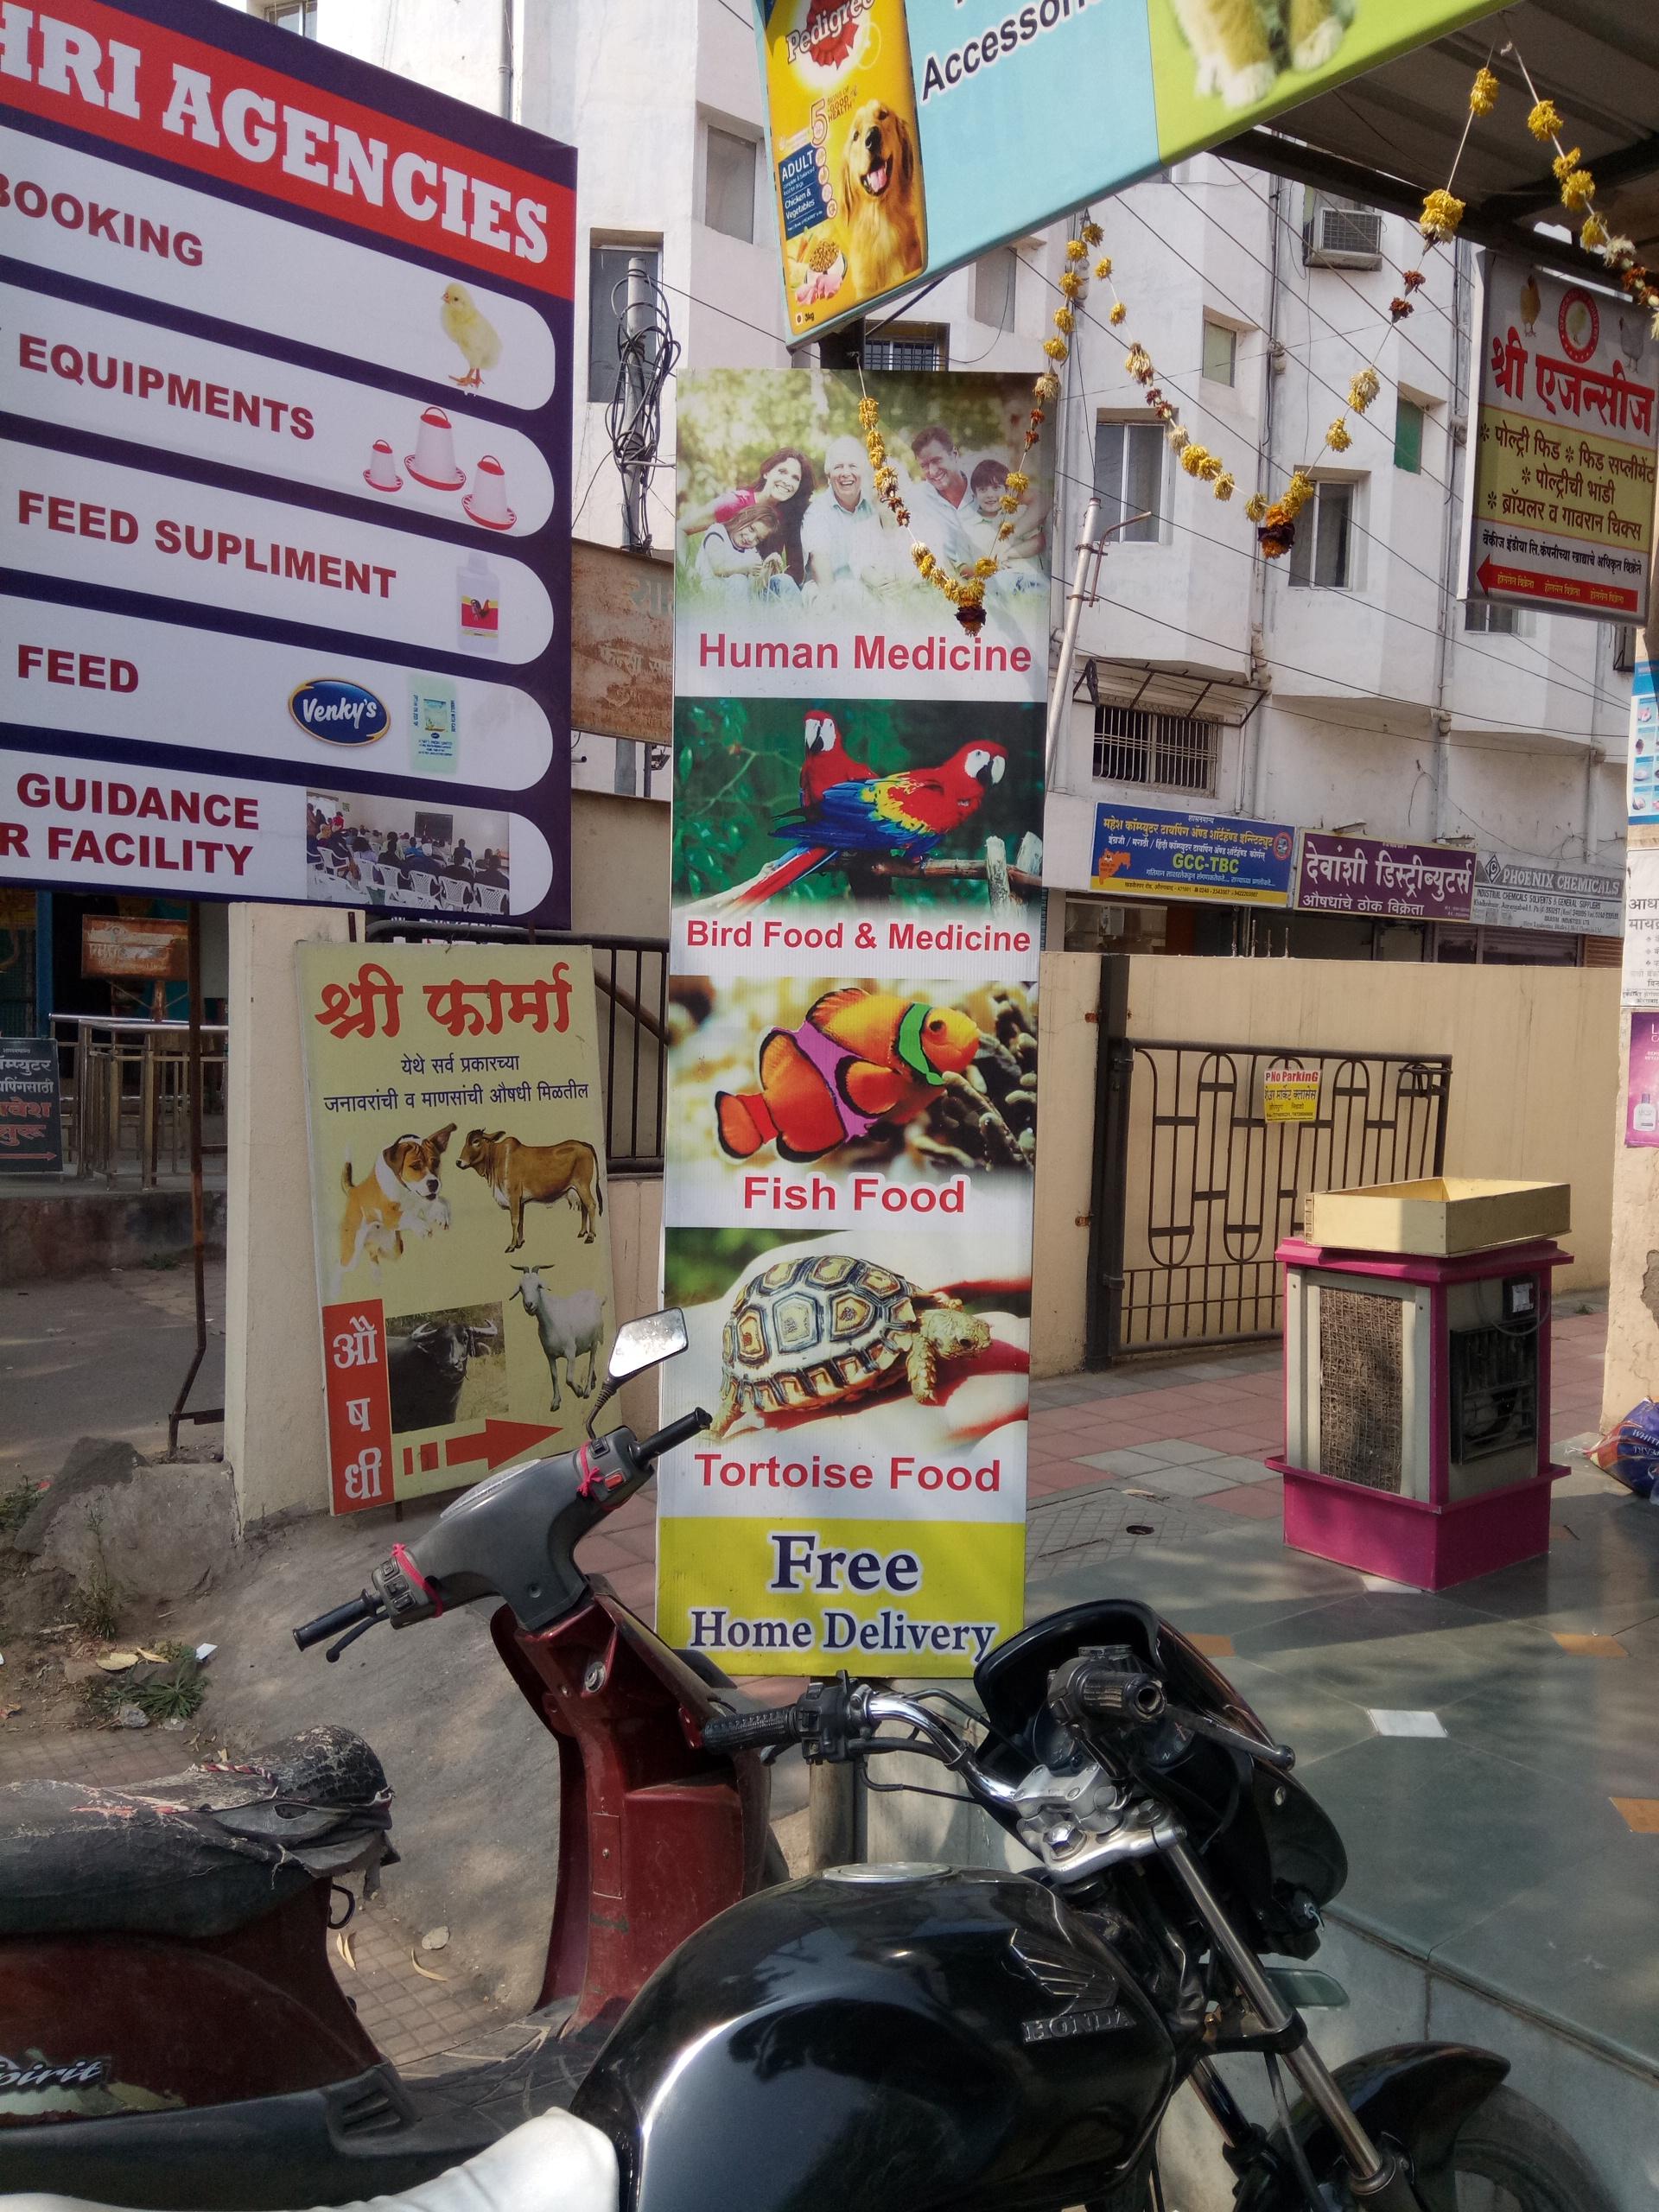 Shri Pharma & Shri Agency_image4